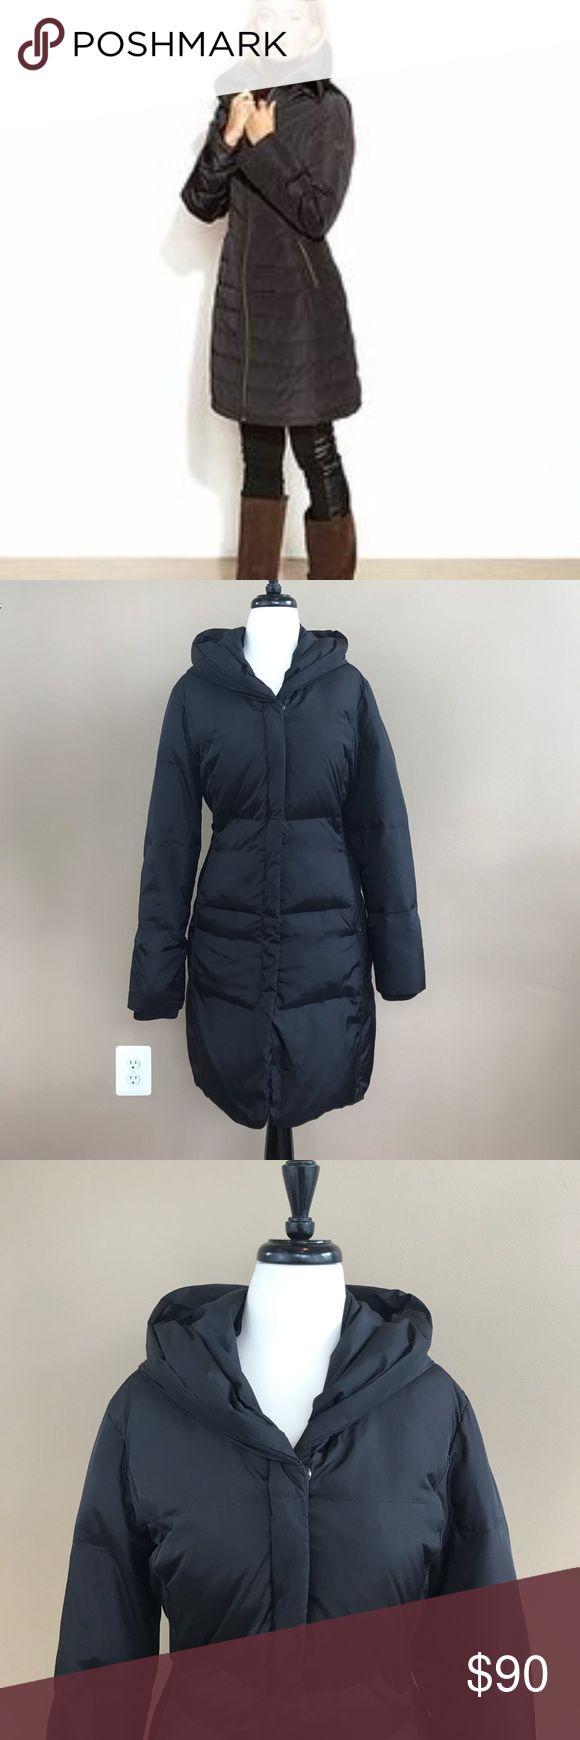 • Michael Kors • Black Long Puffer Coat Jacket M - Michael Kors - Black  - Long Puffer Coat - Medium  - Excellent Condition Michael Kors Jackets & Coats Puffers